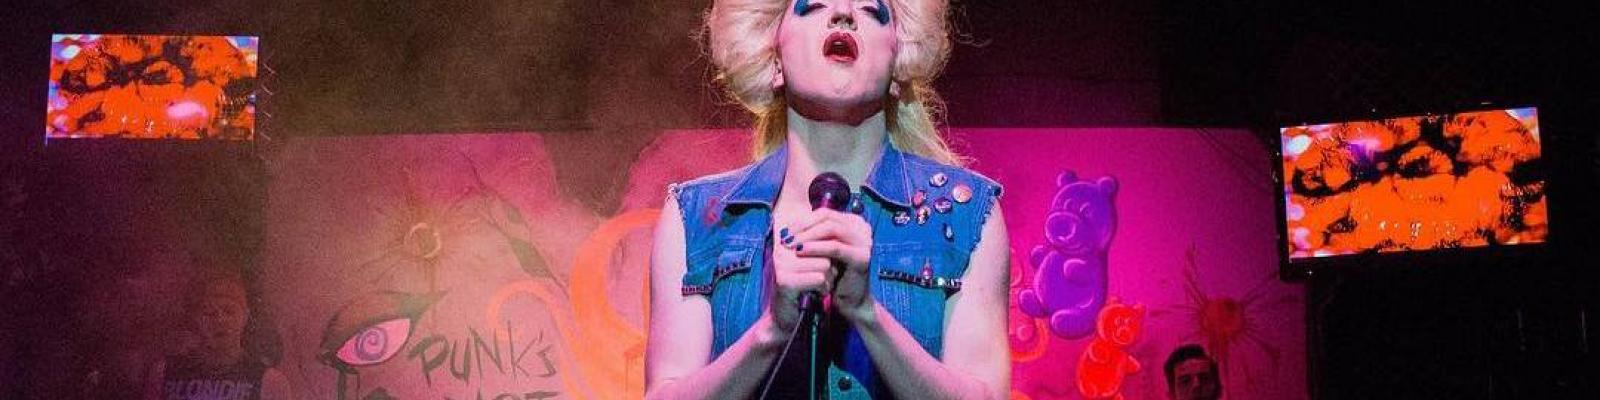 Hedwig-Dress-Banner-by-Briana-Gately.jpg